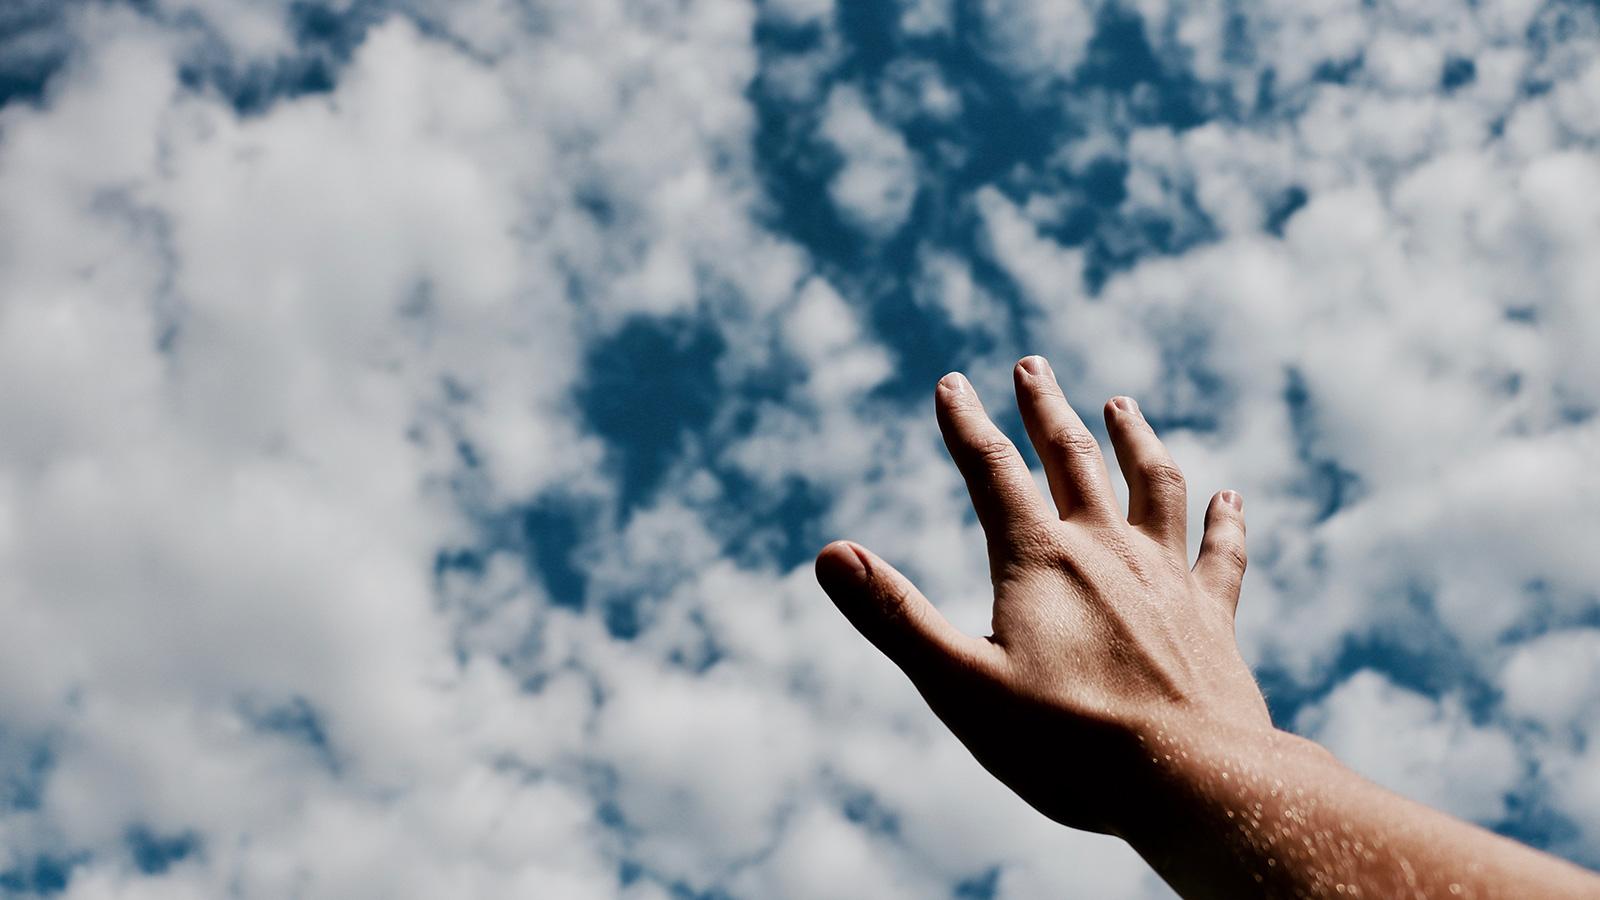 I Believe God Is Gracious